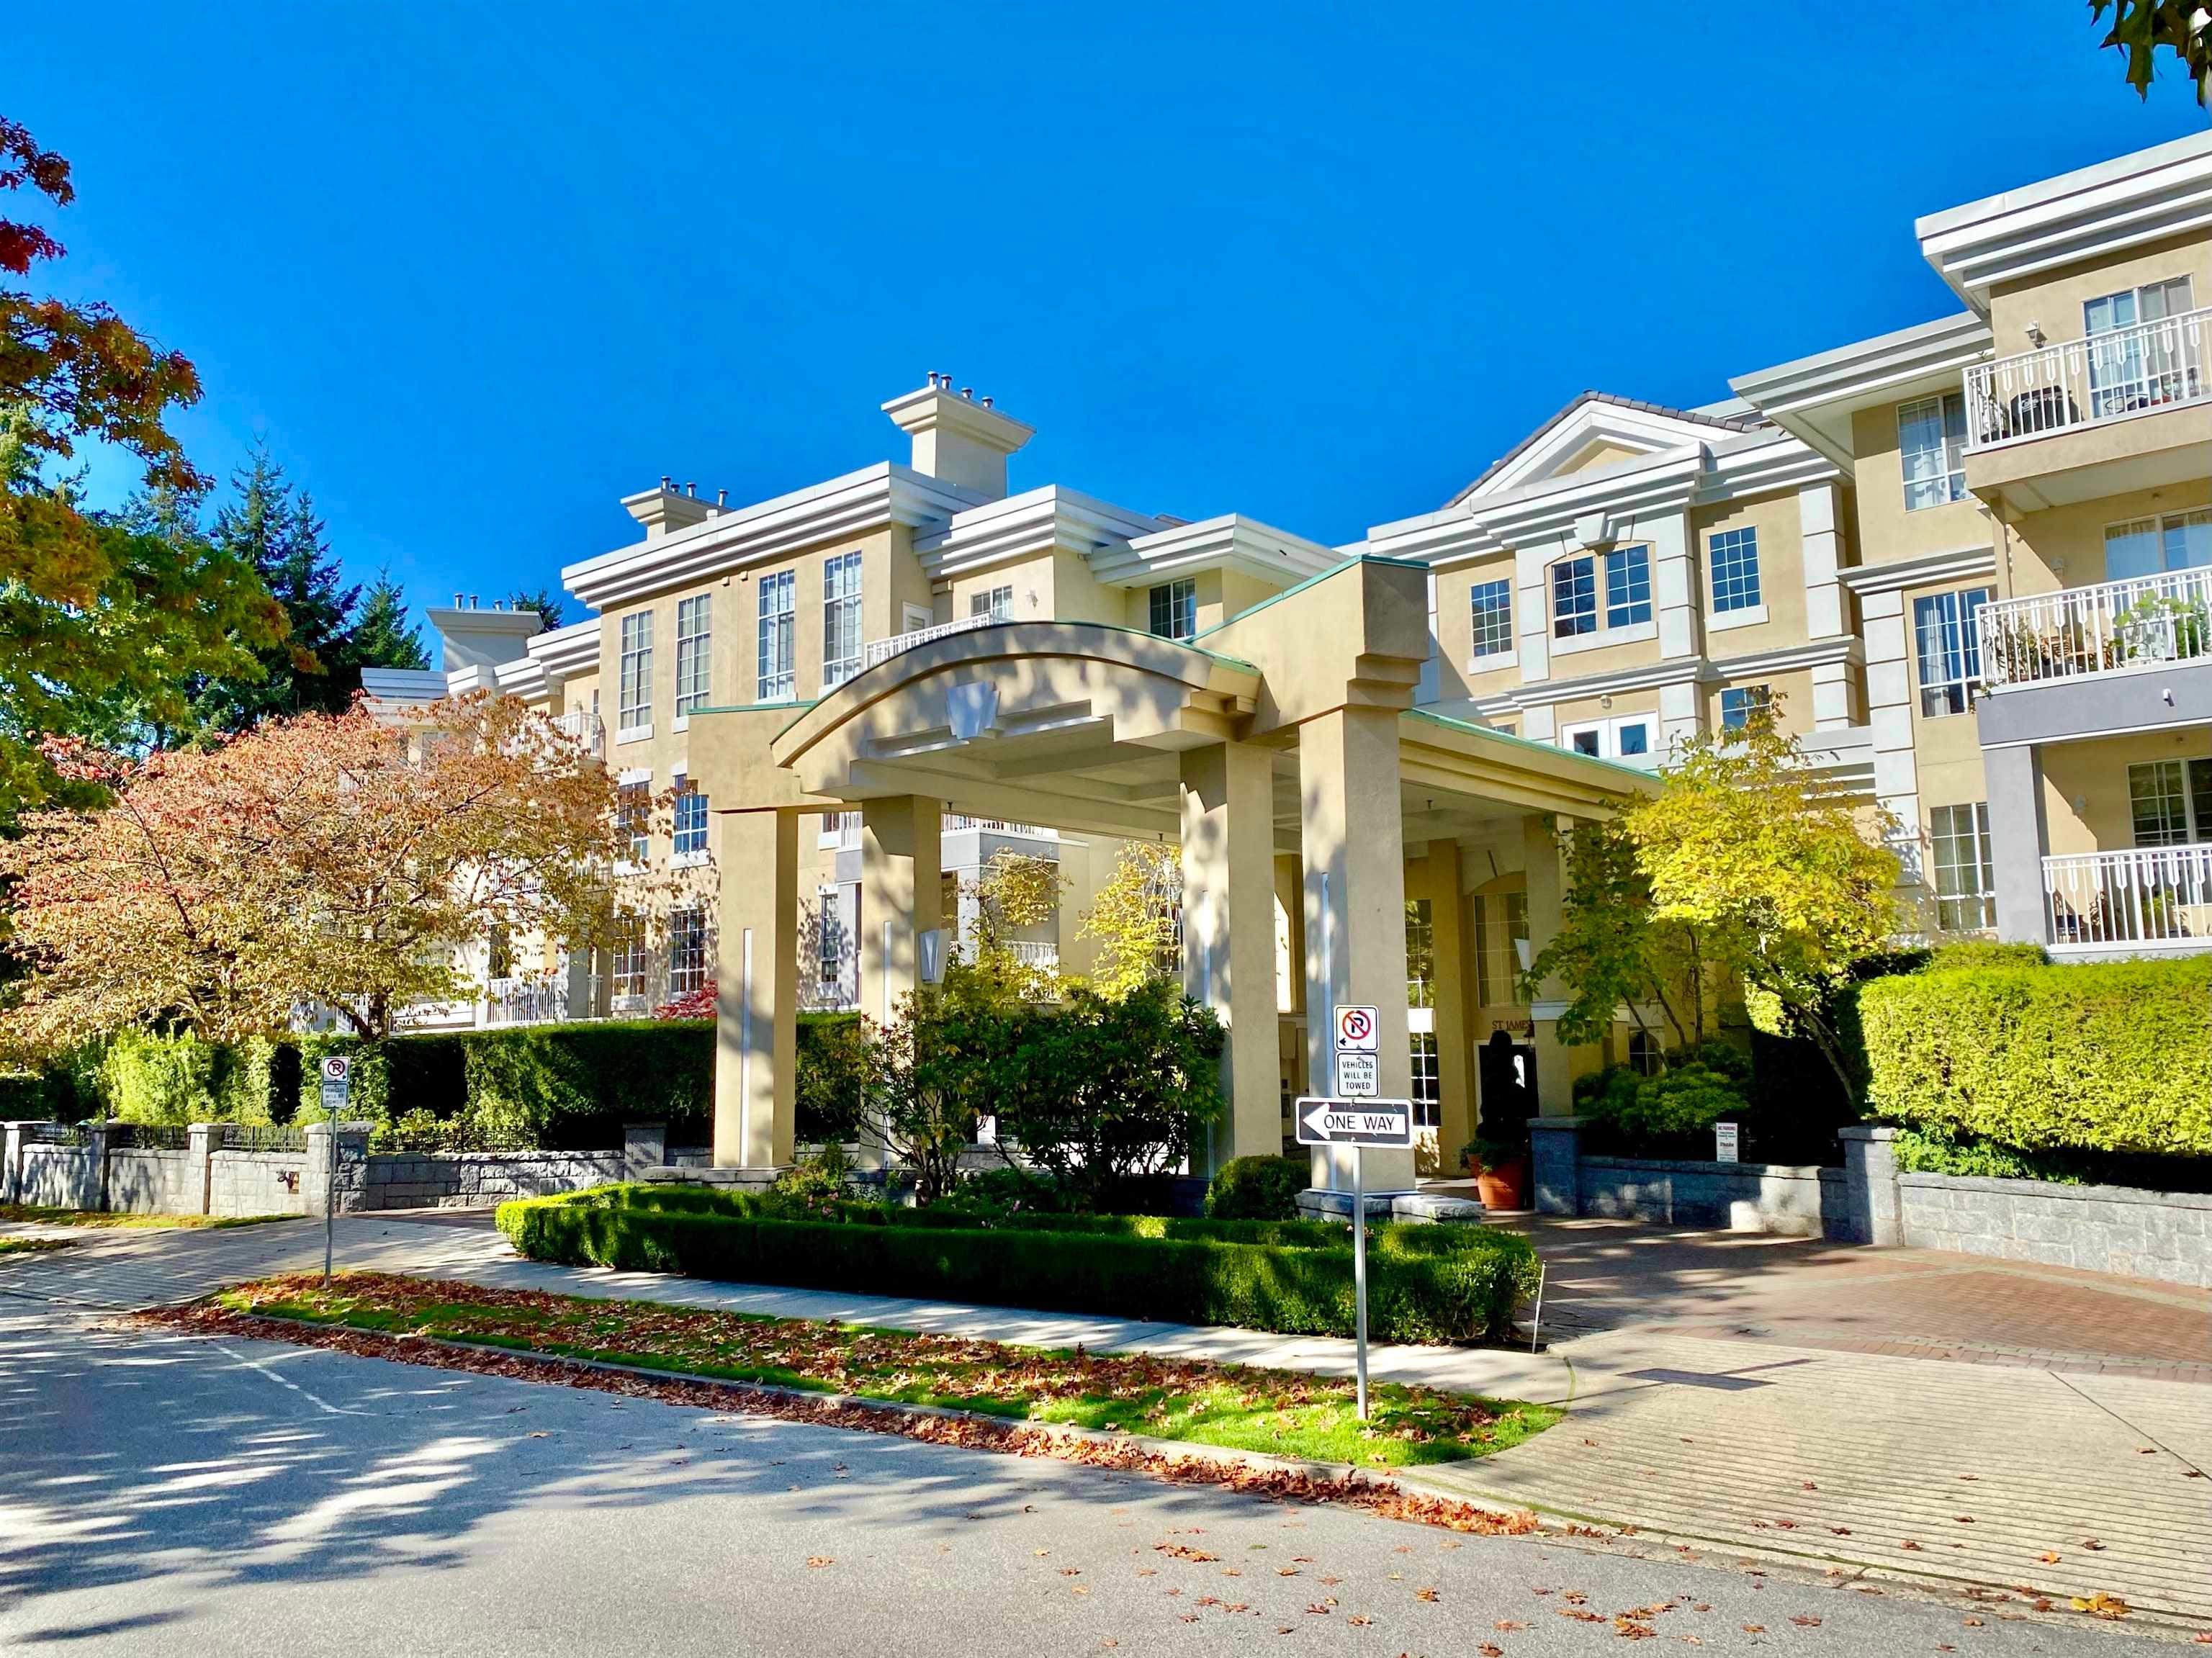 211 5835 HAMPTON PLACE - University VW Apartment/Condo for sale, 2 Bedrooms (R2625395)